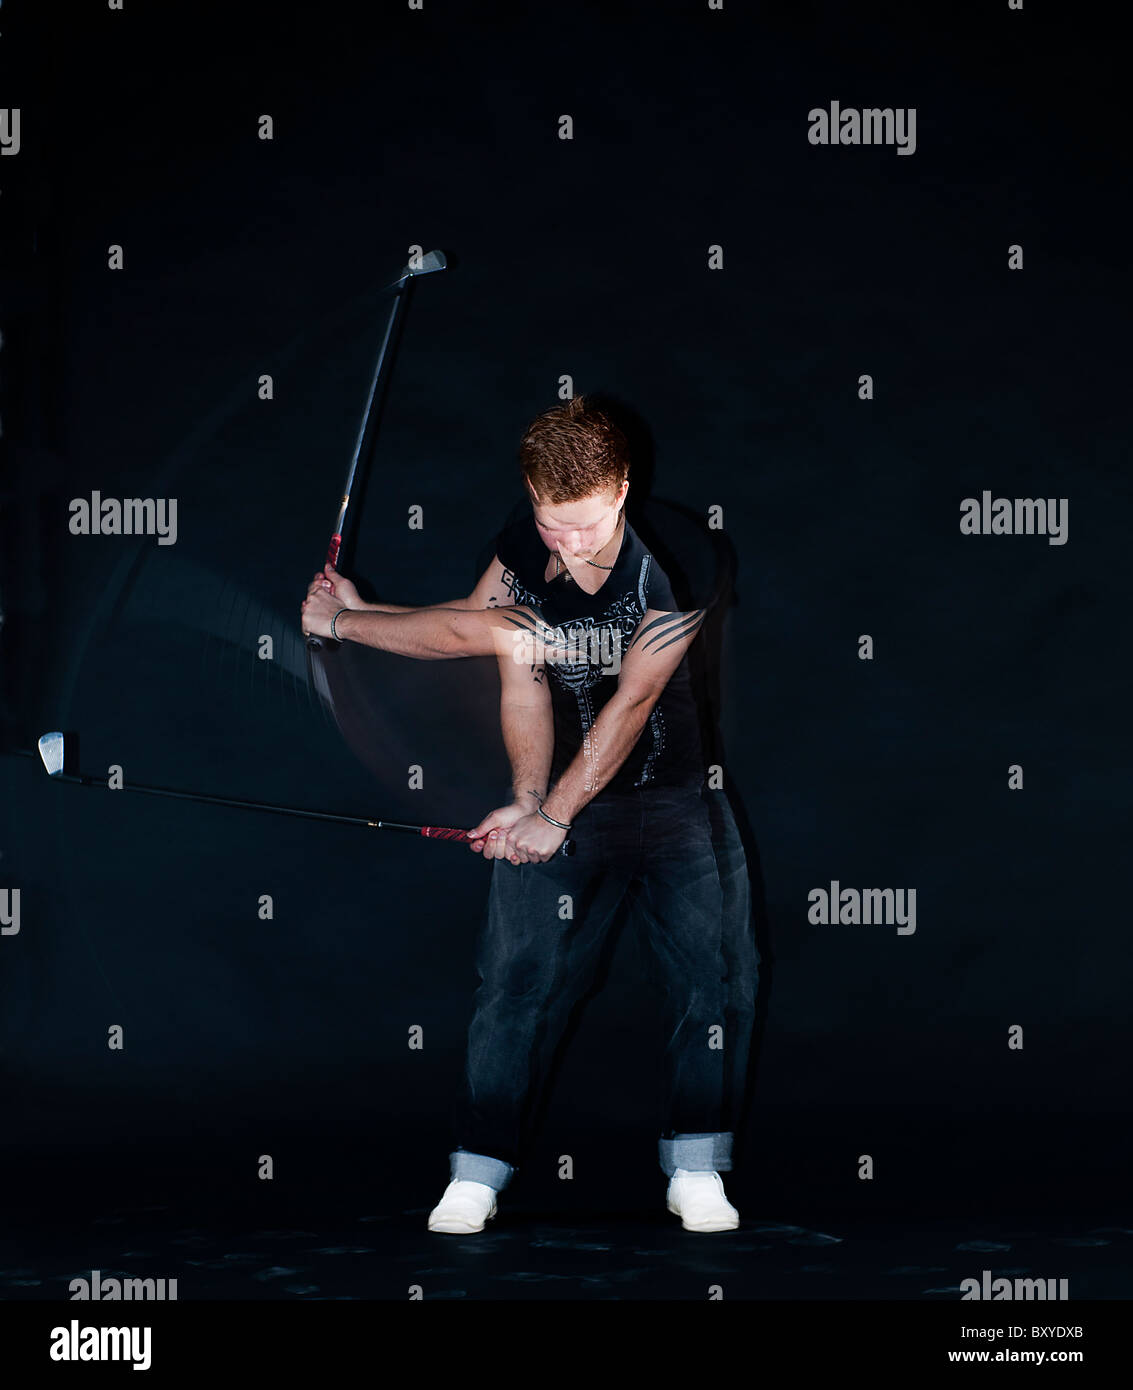 Golf-Schwenkbewegung Stockfoto